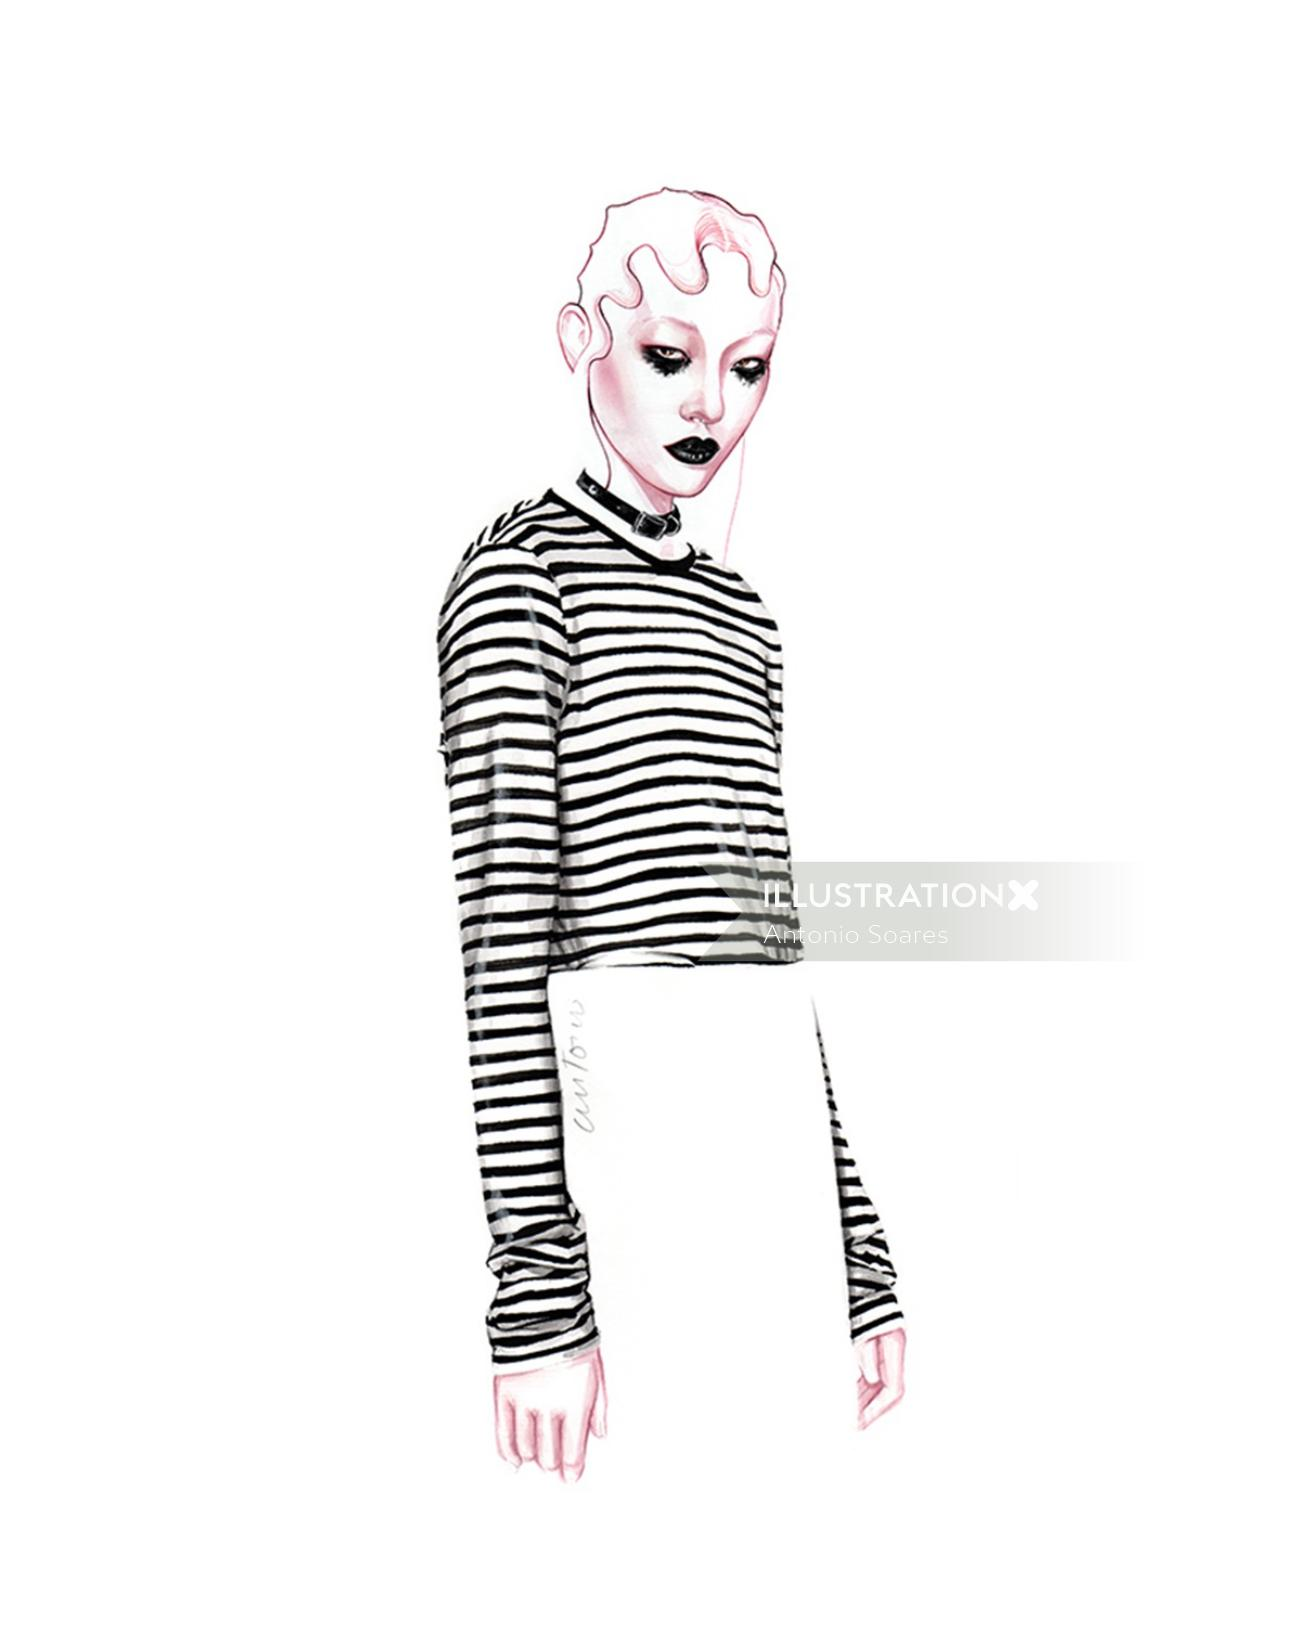 Marc Jacobs fashion design by Antonio Soares